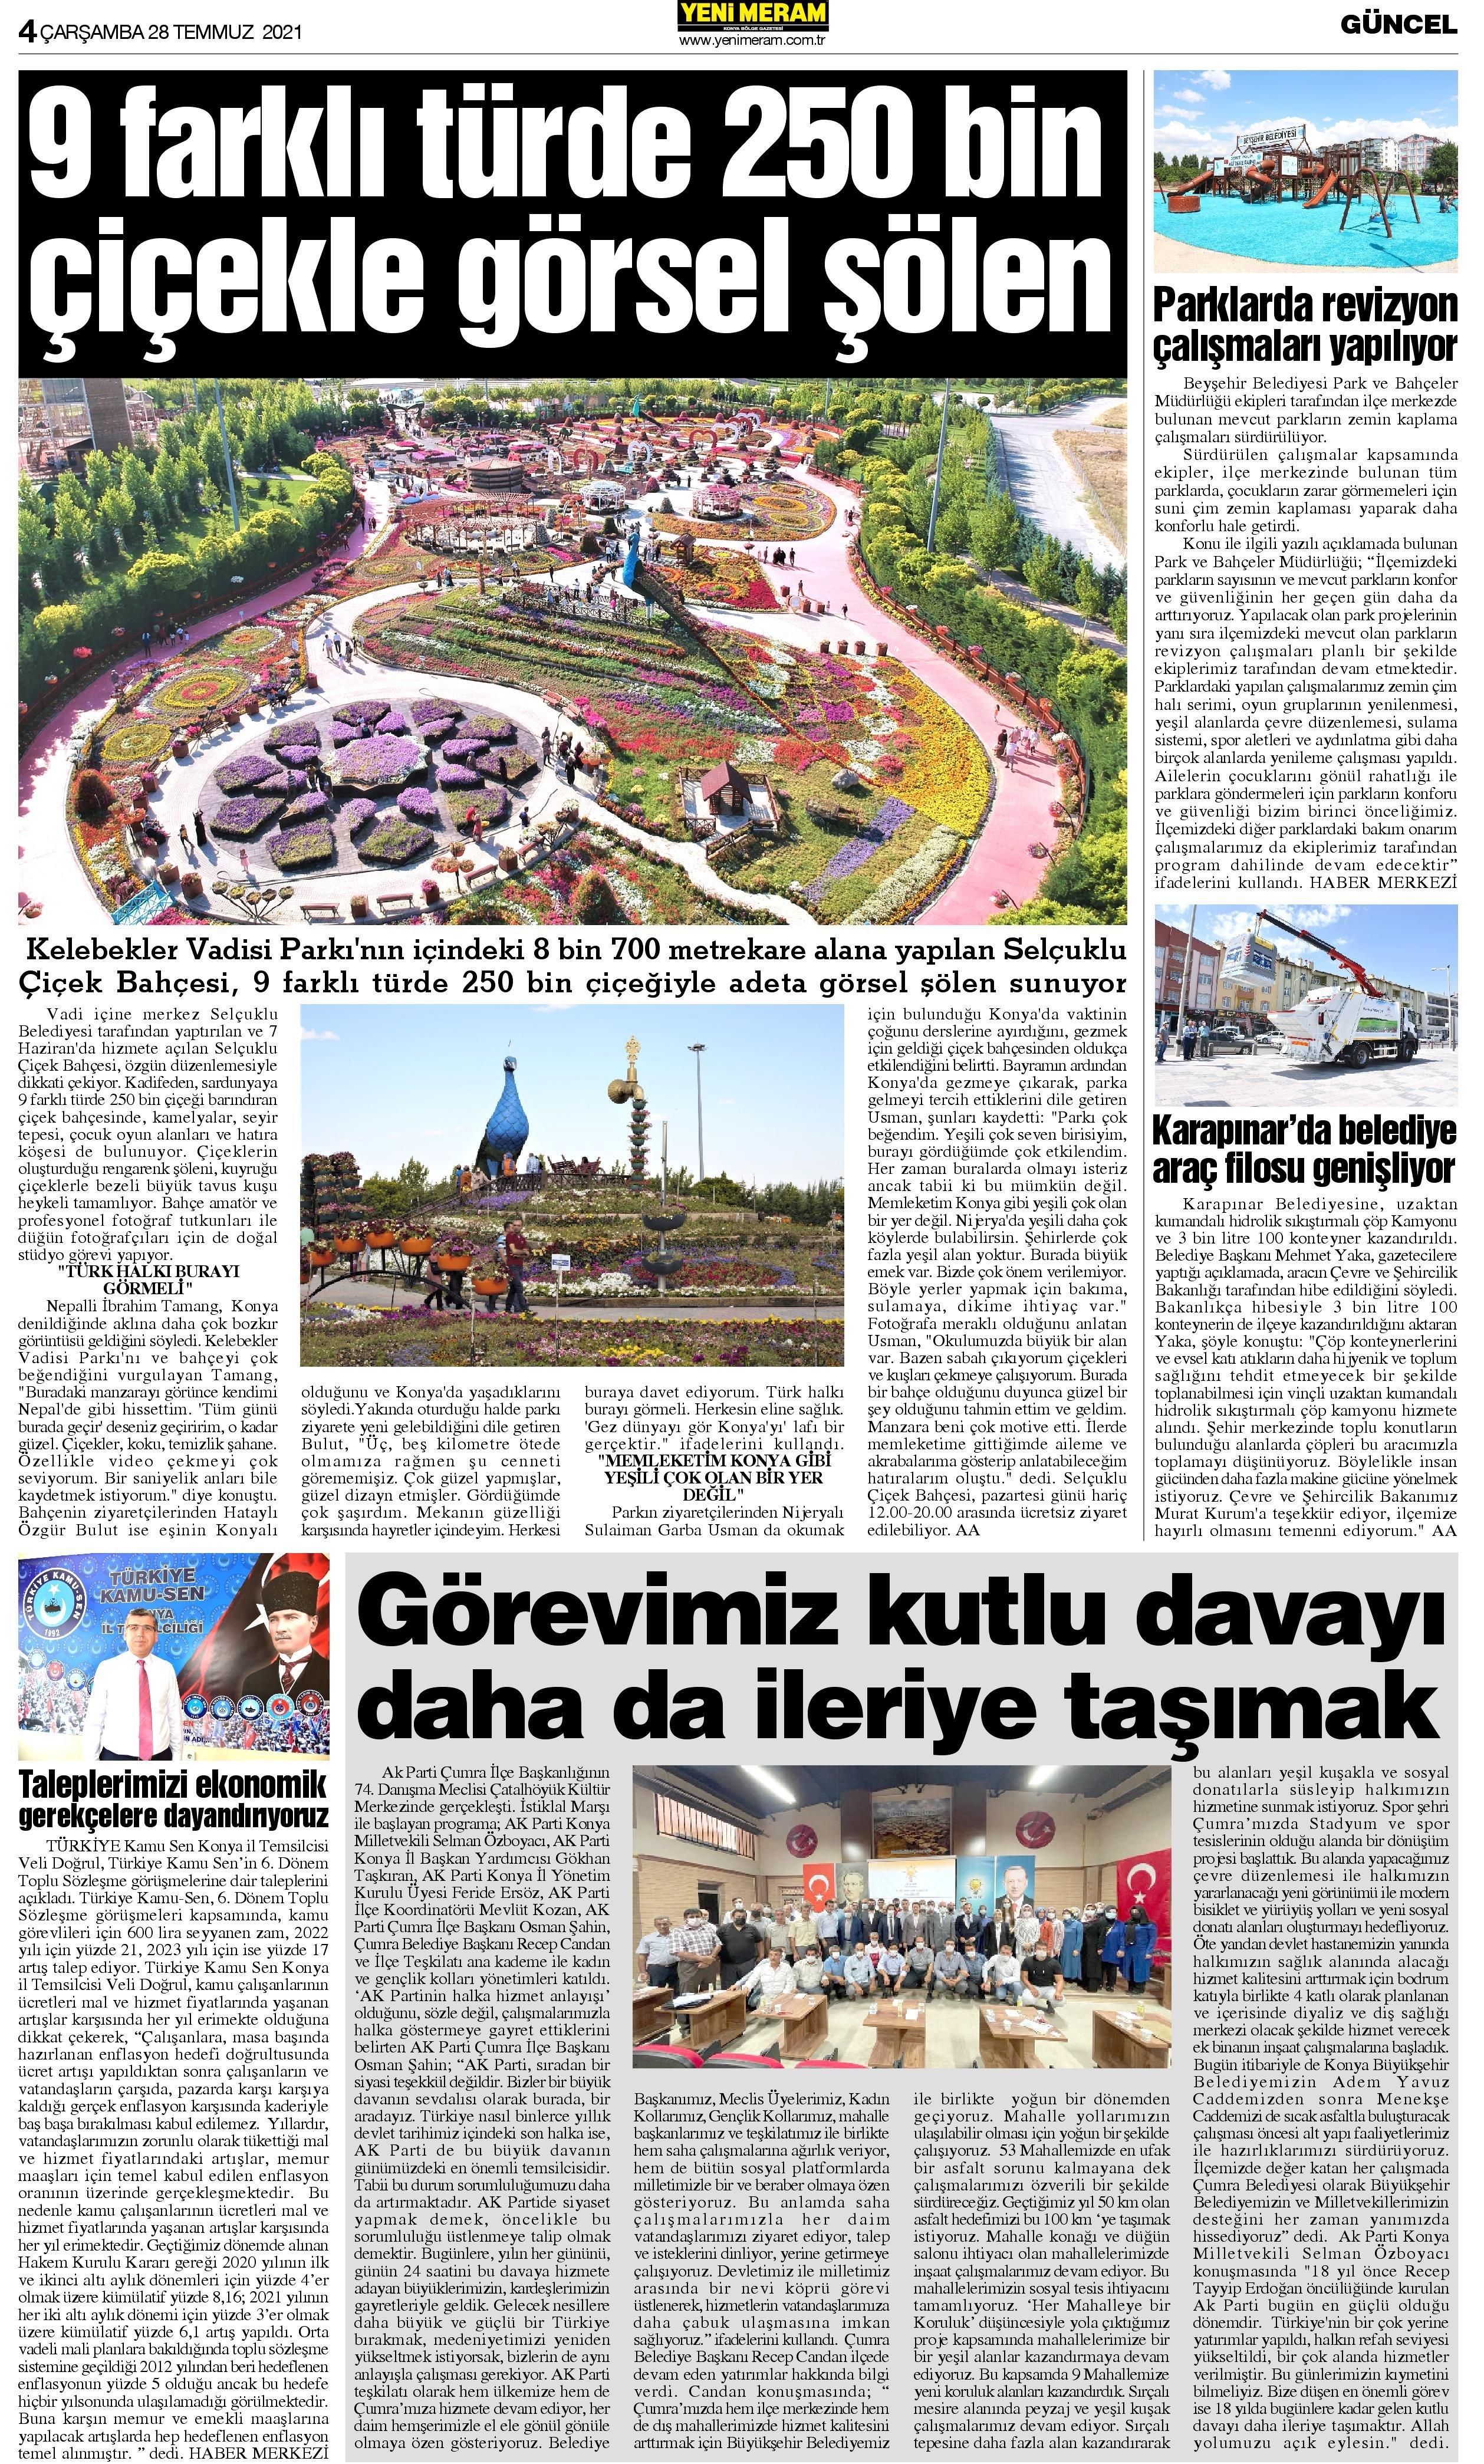 28 Temmuz 2021 Yeni Meram Gazetesi